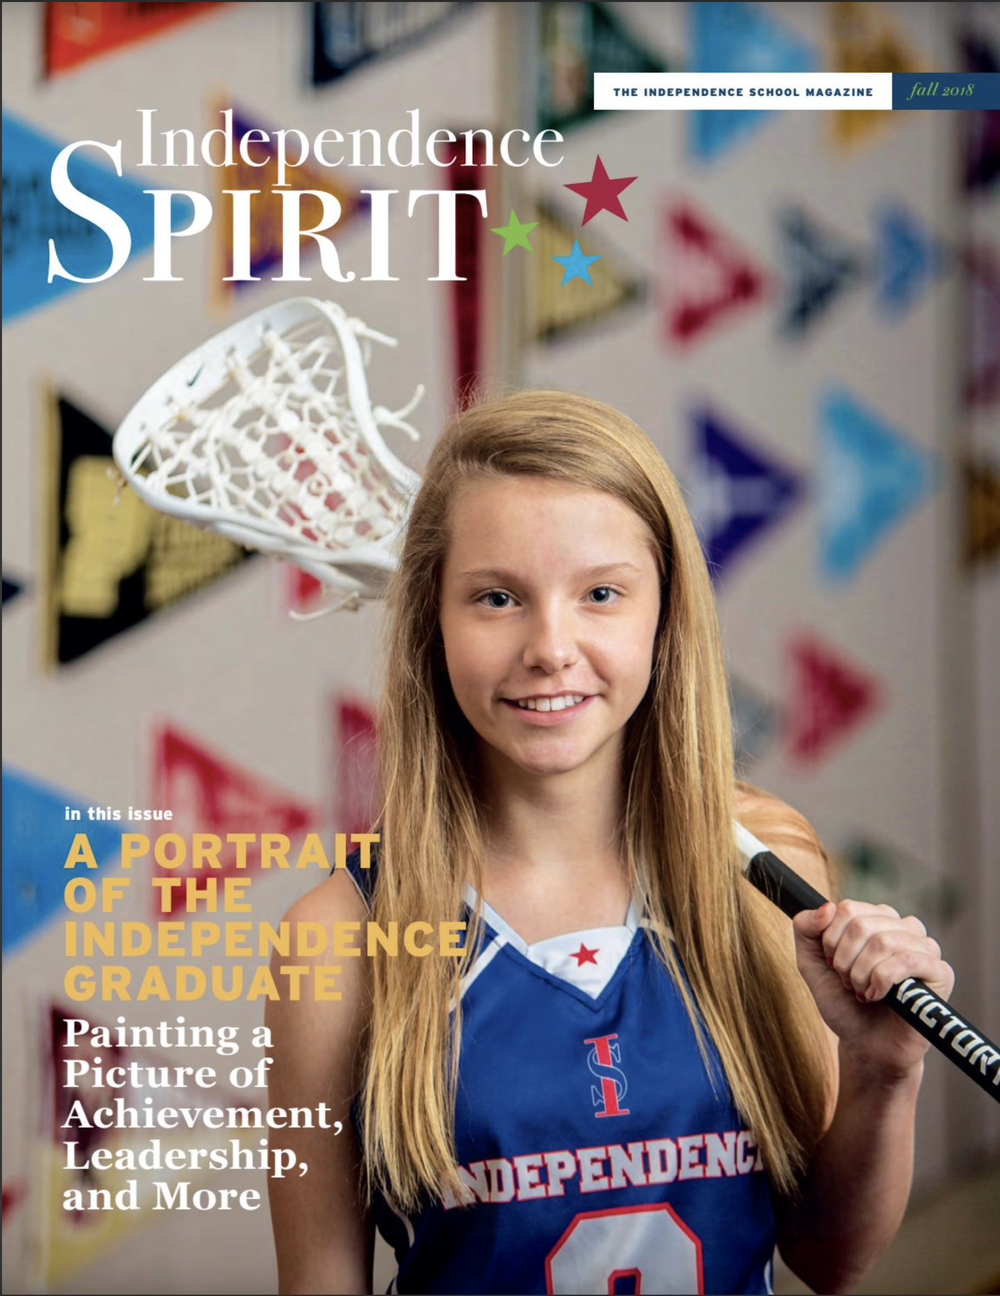 kelsh-wilson-design-the-independence-school-spirit-cover.png